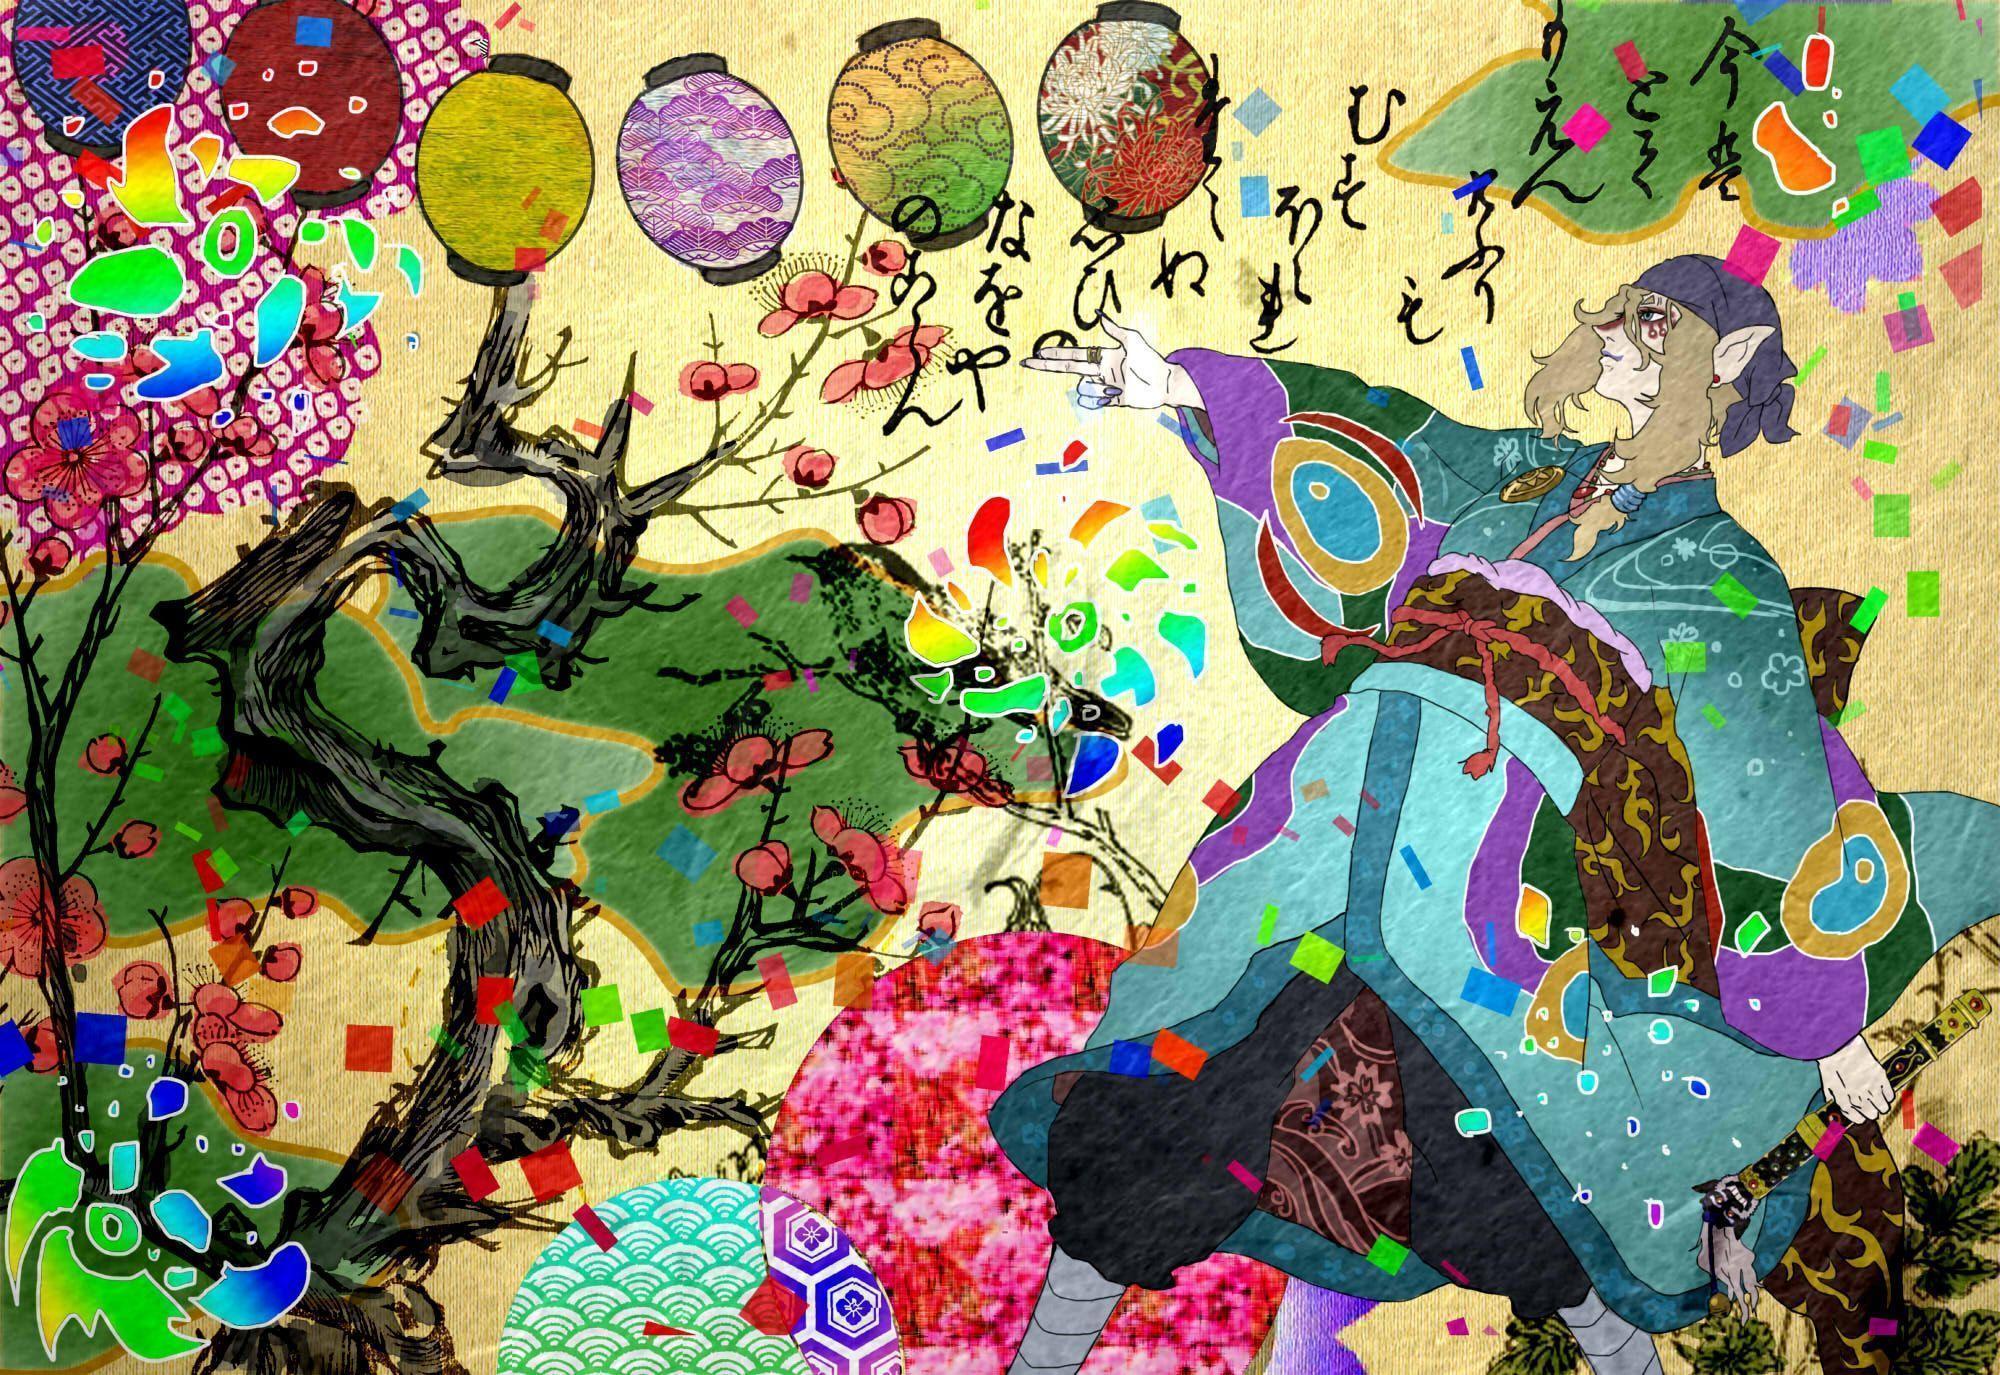 Princess mononoke wallpapers wallpaper cave - Mononoke anime wallpaper ...